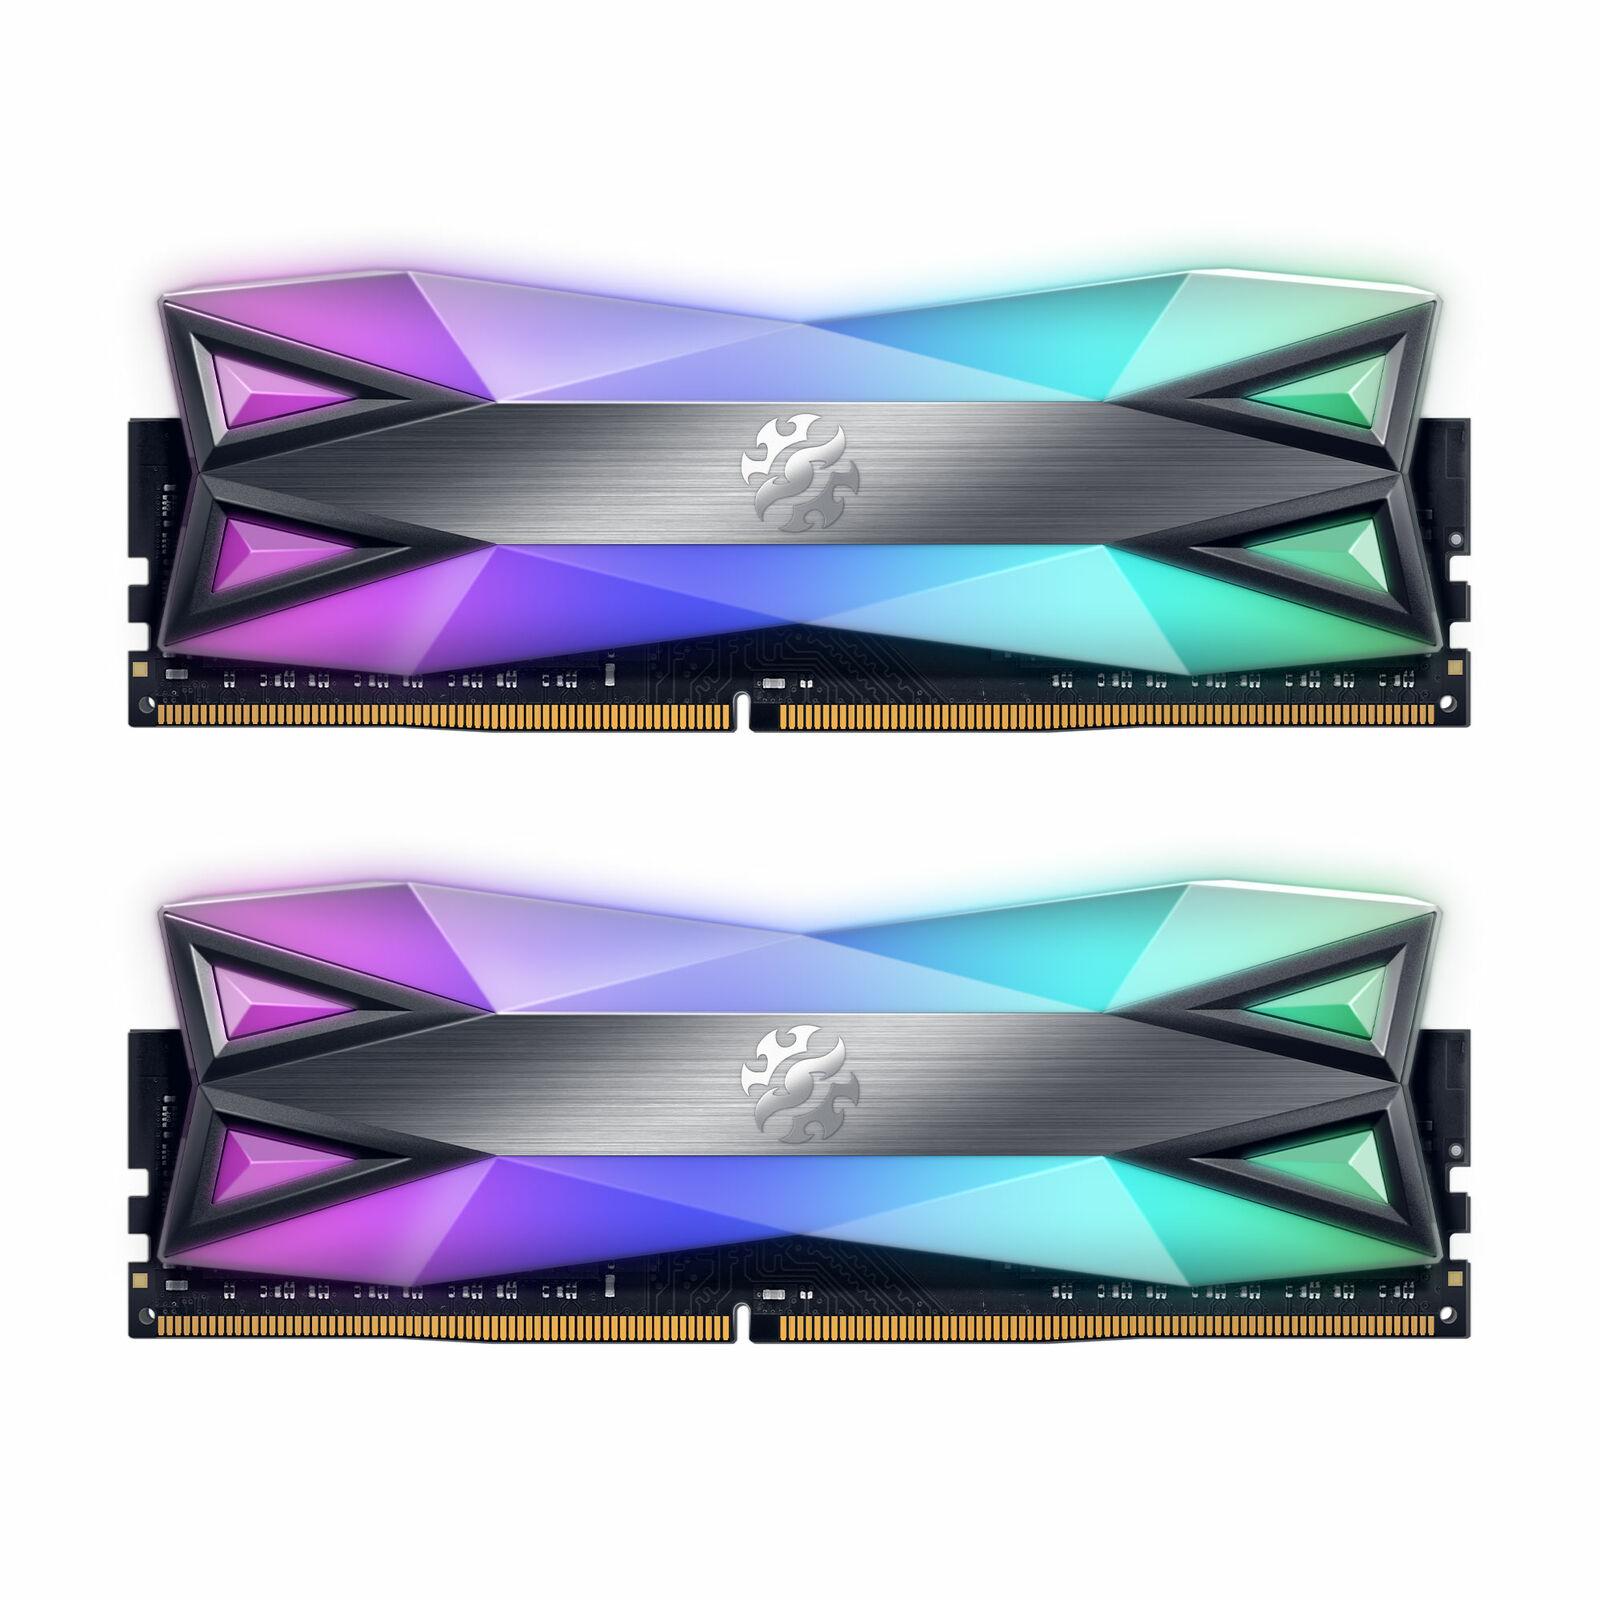 XPG SPECTRIX D60G RGB Desktop Memory: 16GB (2x8GB) DDR4 3200MHz CL16 GREY. Buy it now for 84.99